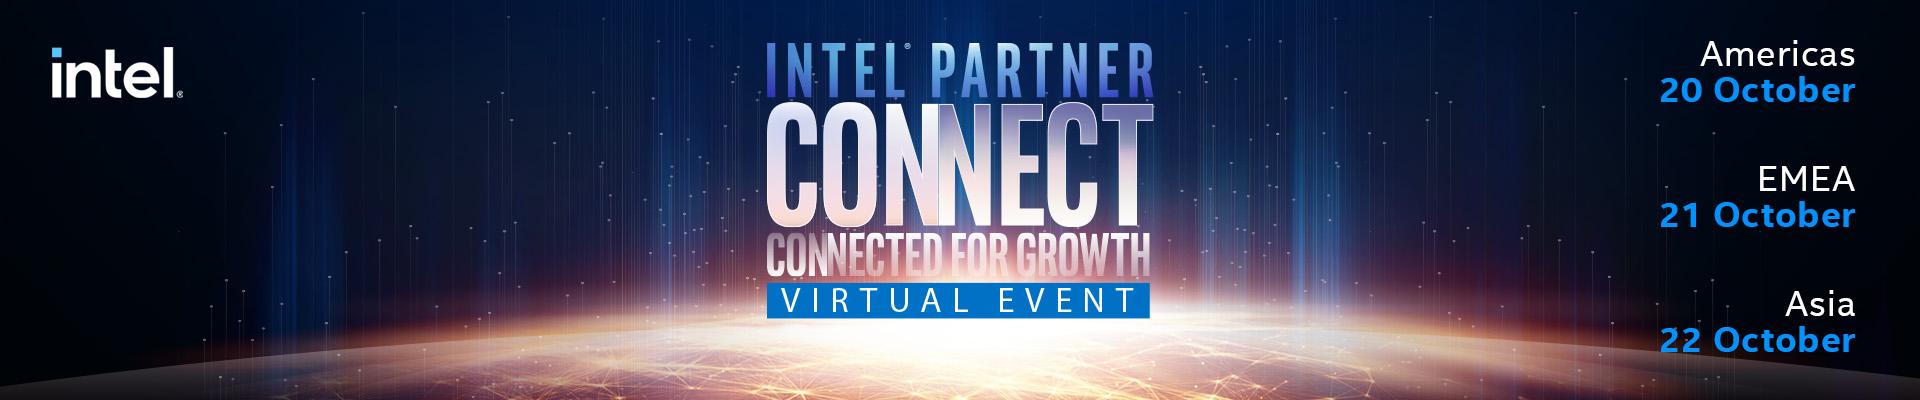 IPC 2020 Intel Partner Connect Global Fall Virtual